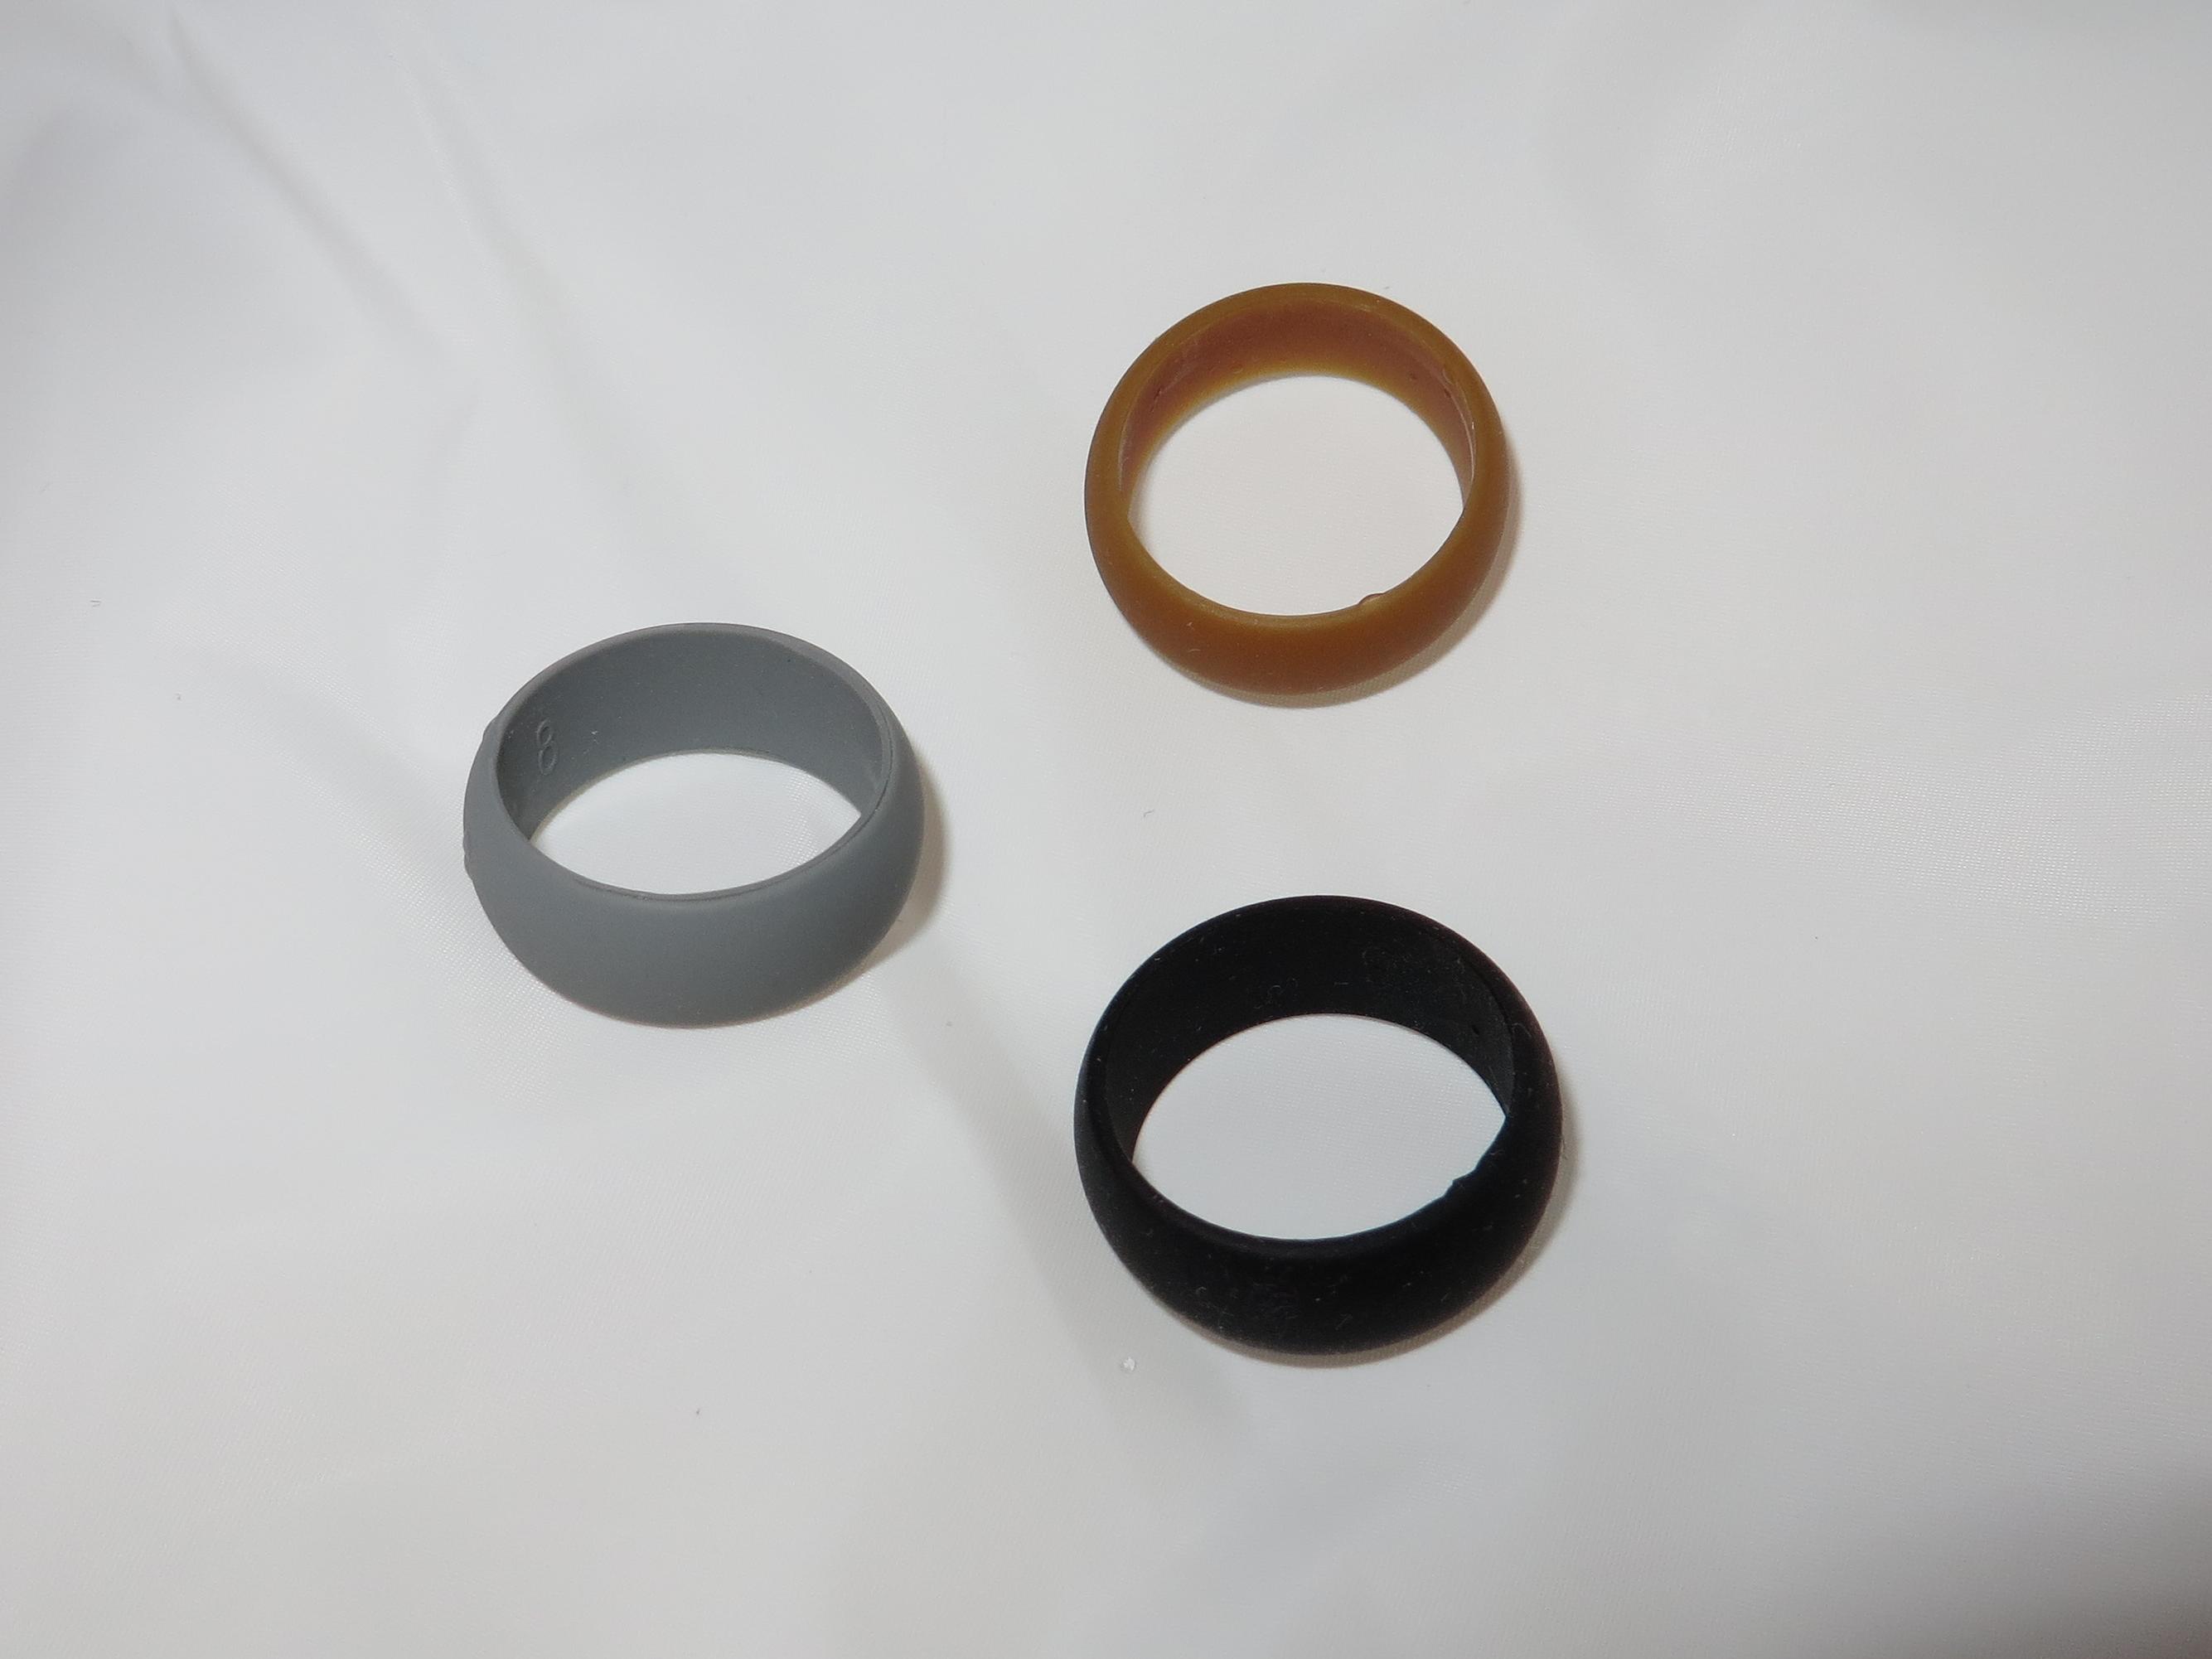 Non Conductive Weding Rings 013 - Non Conductive Weding Rings